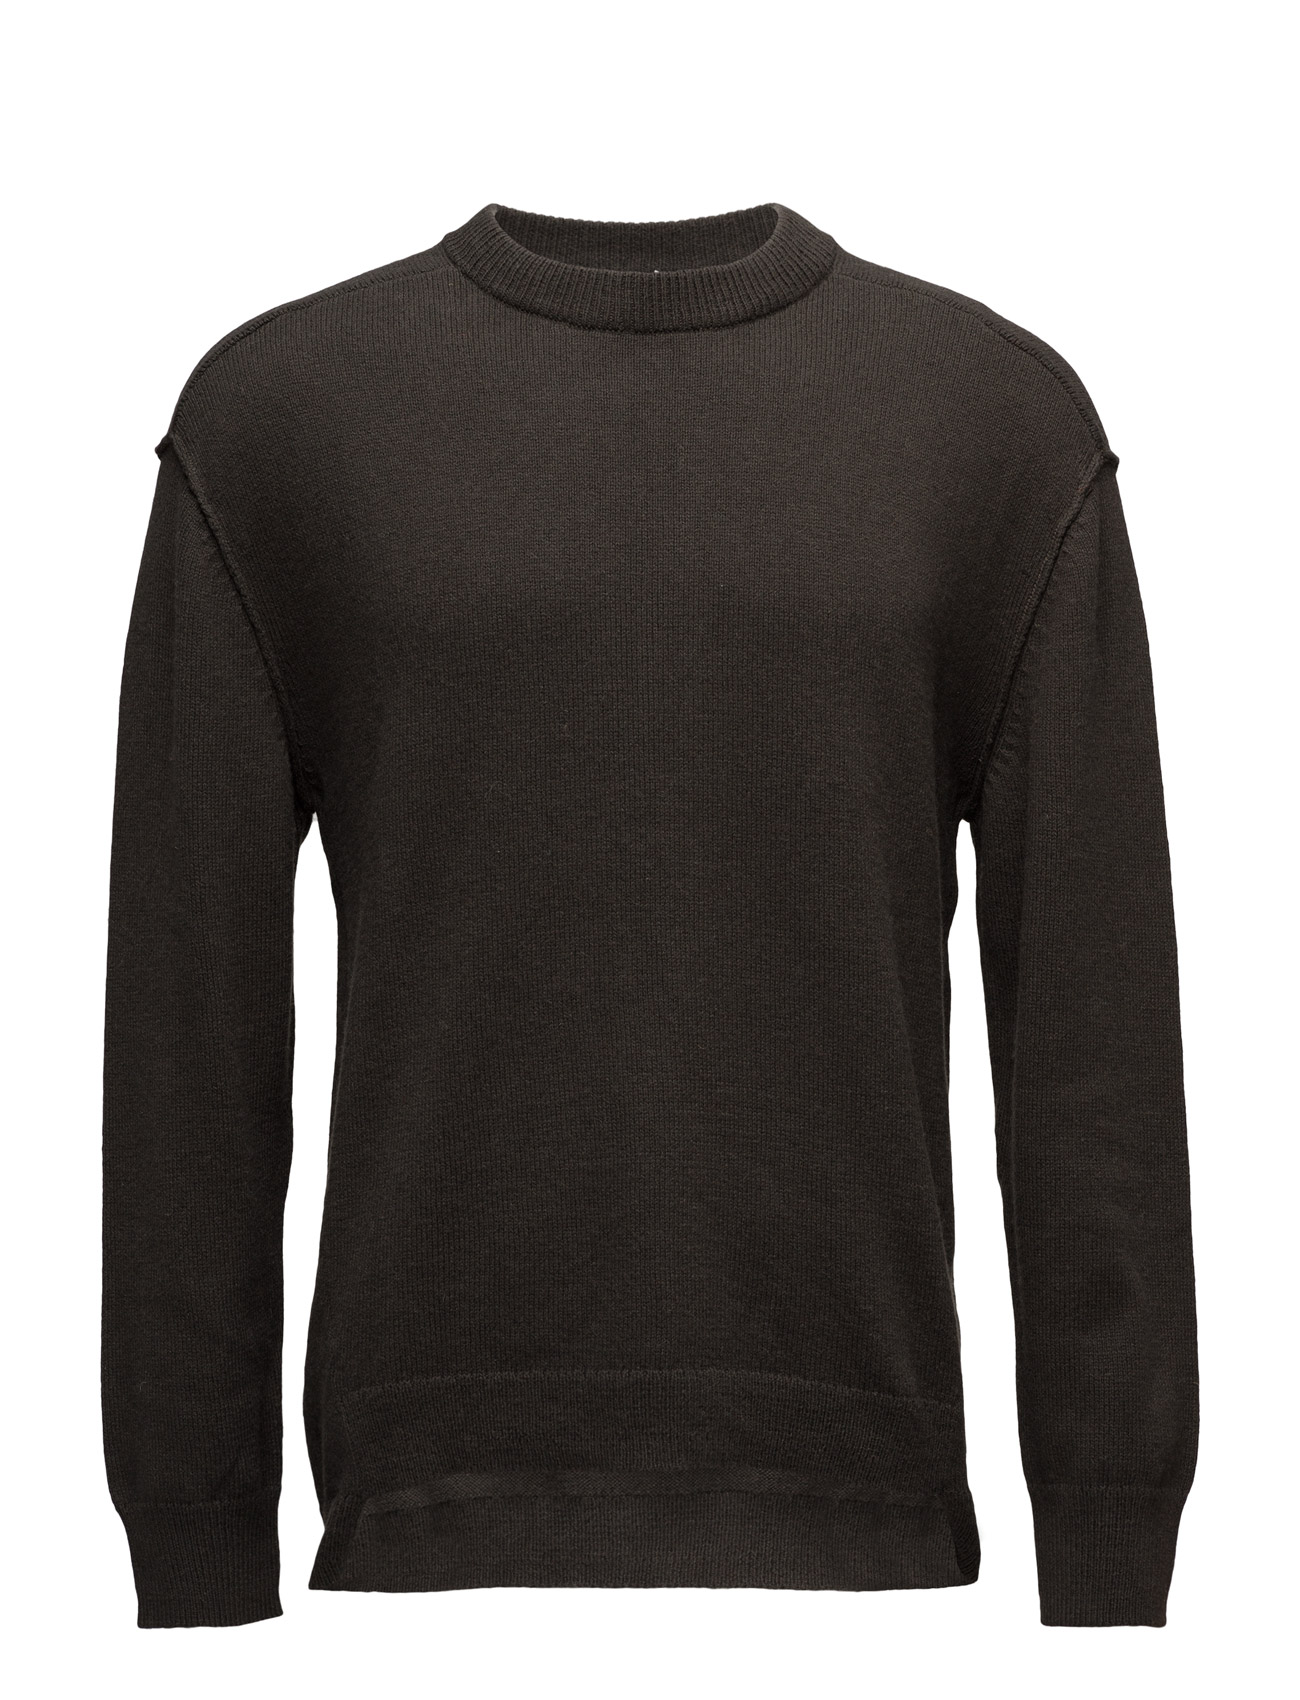 M. Organic Cotton/Yak Sweater Filippa K Rundhalsede til Herrer i